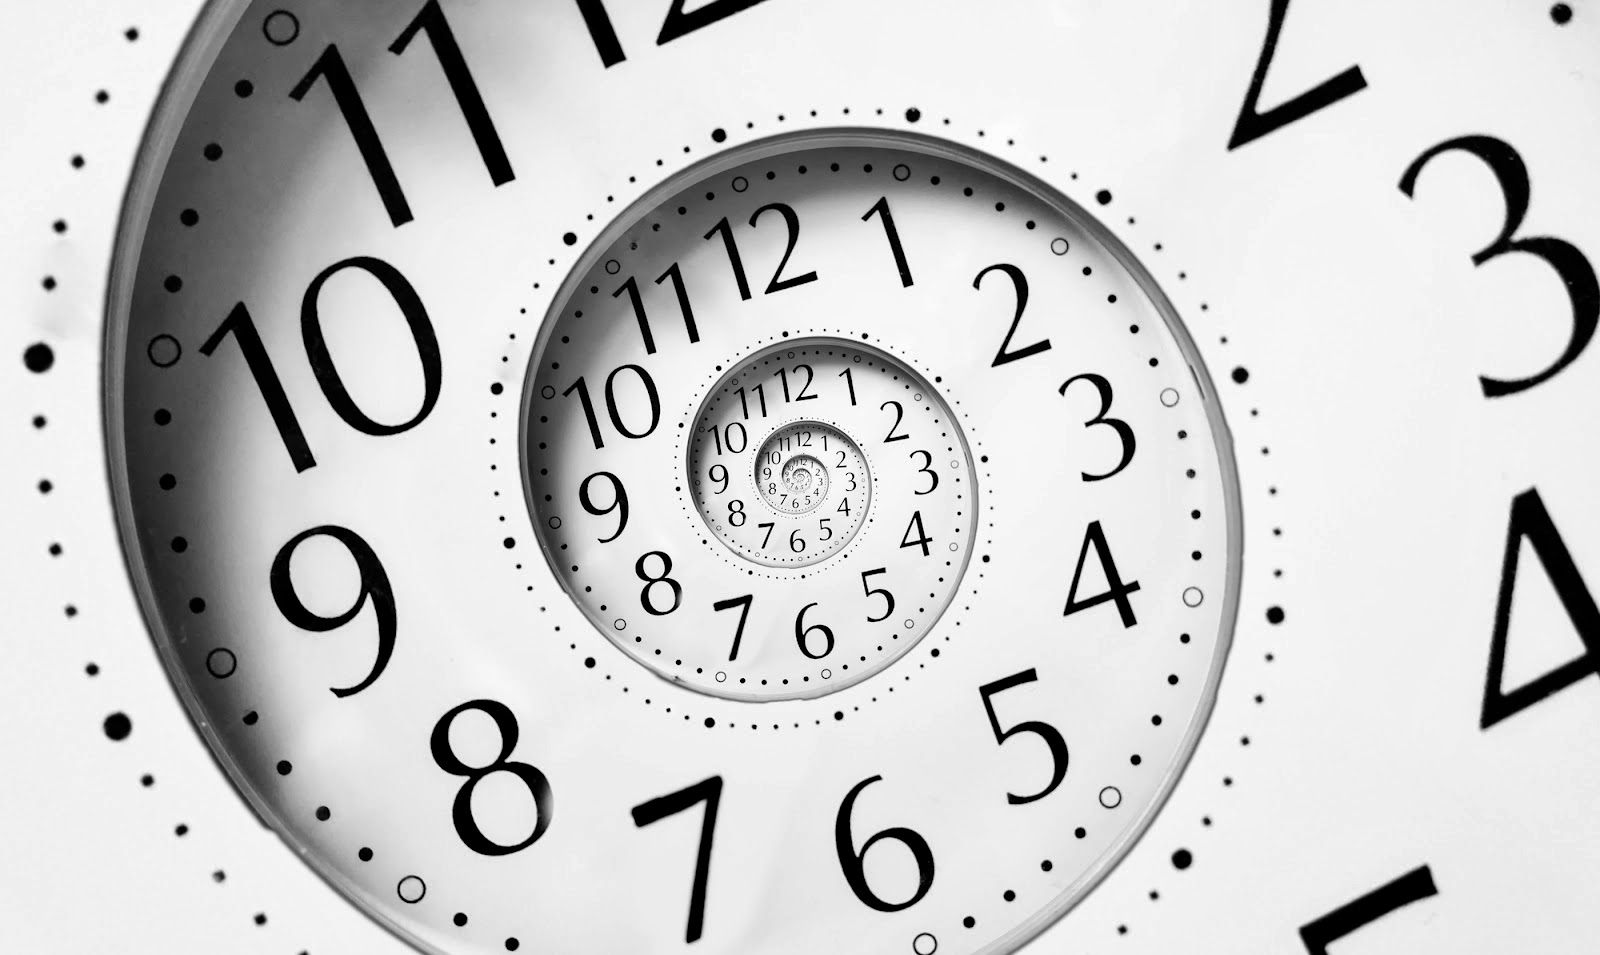 no time, time problem, zamanım yok, saat